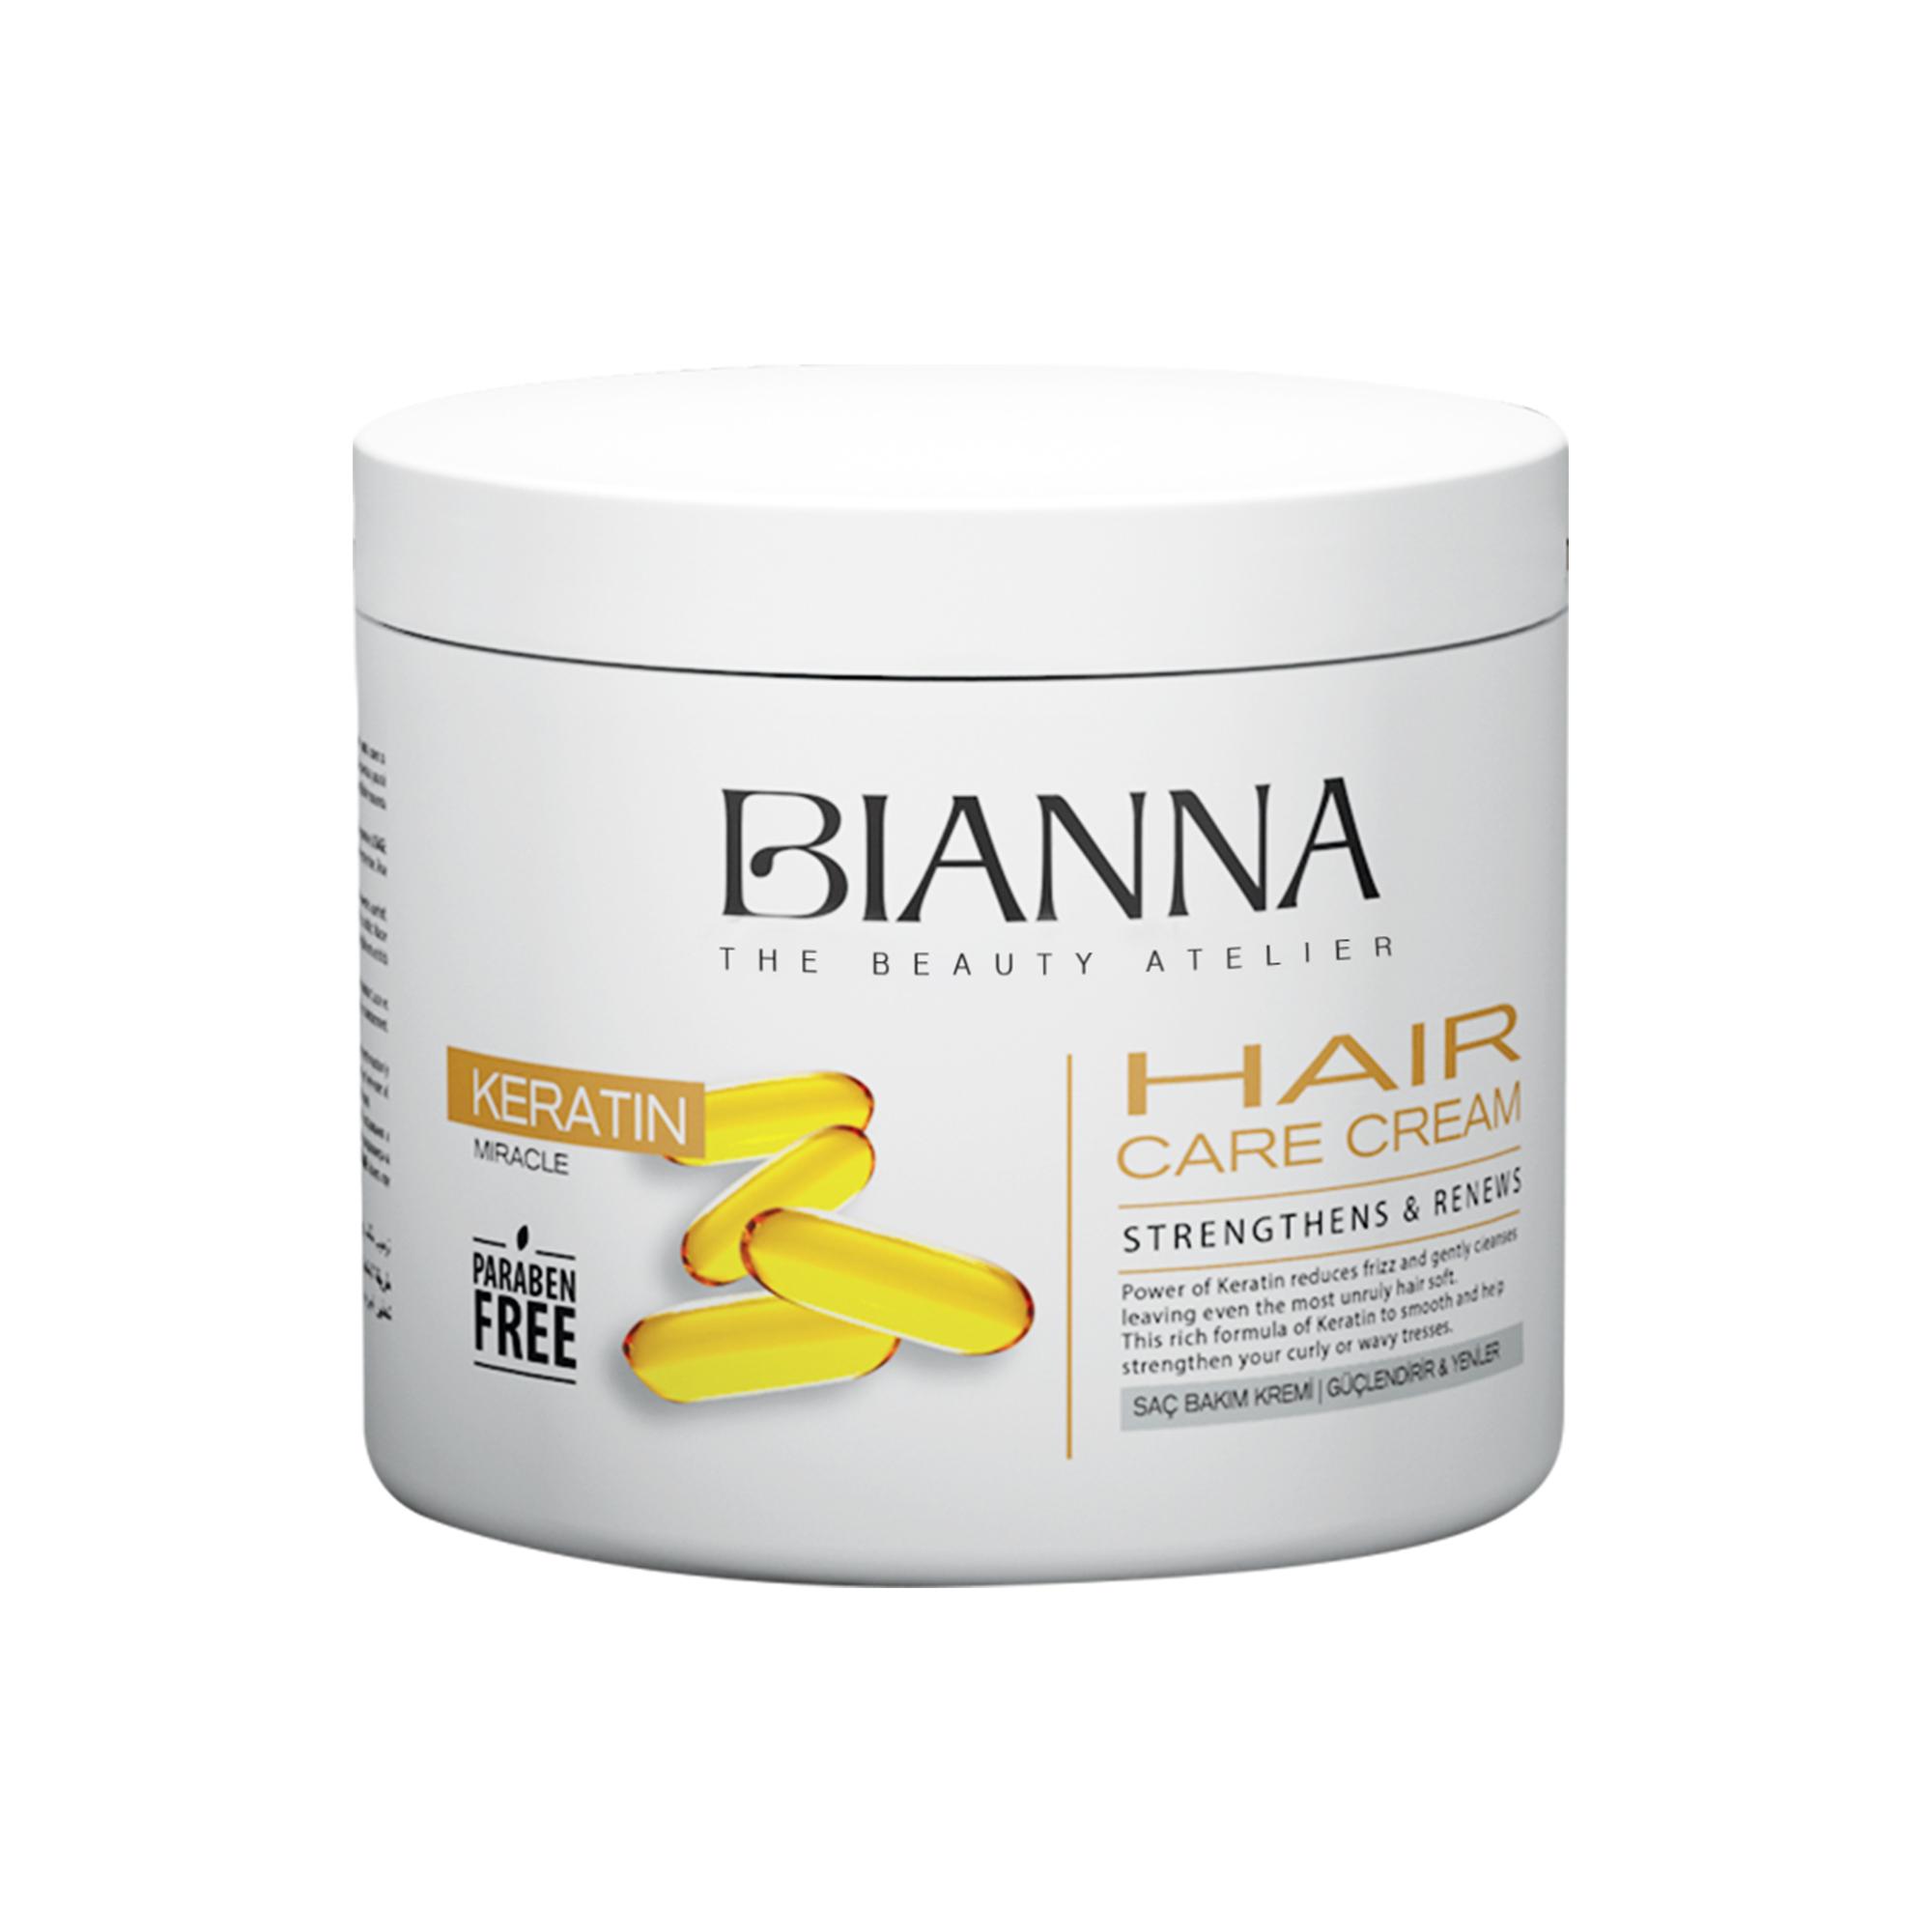 BIANNA HAIR CARE CREAM - KERATIN / 2203-02